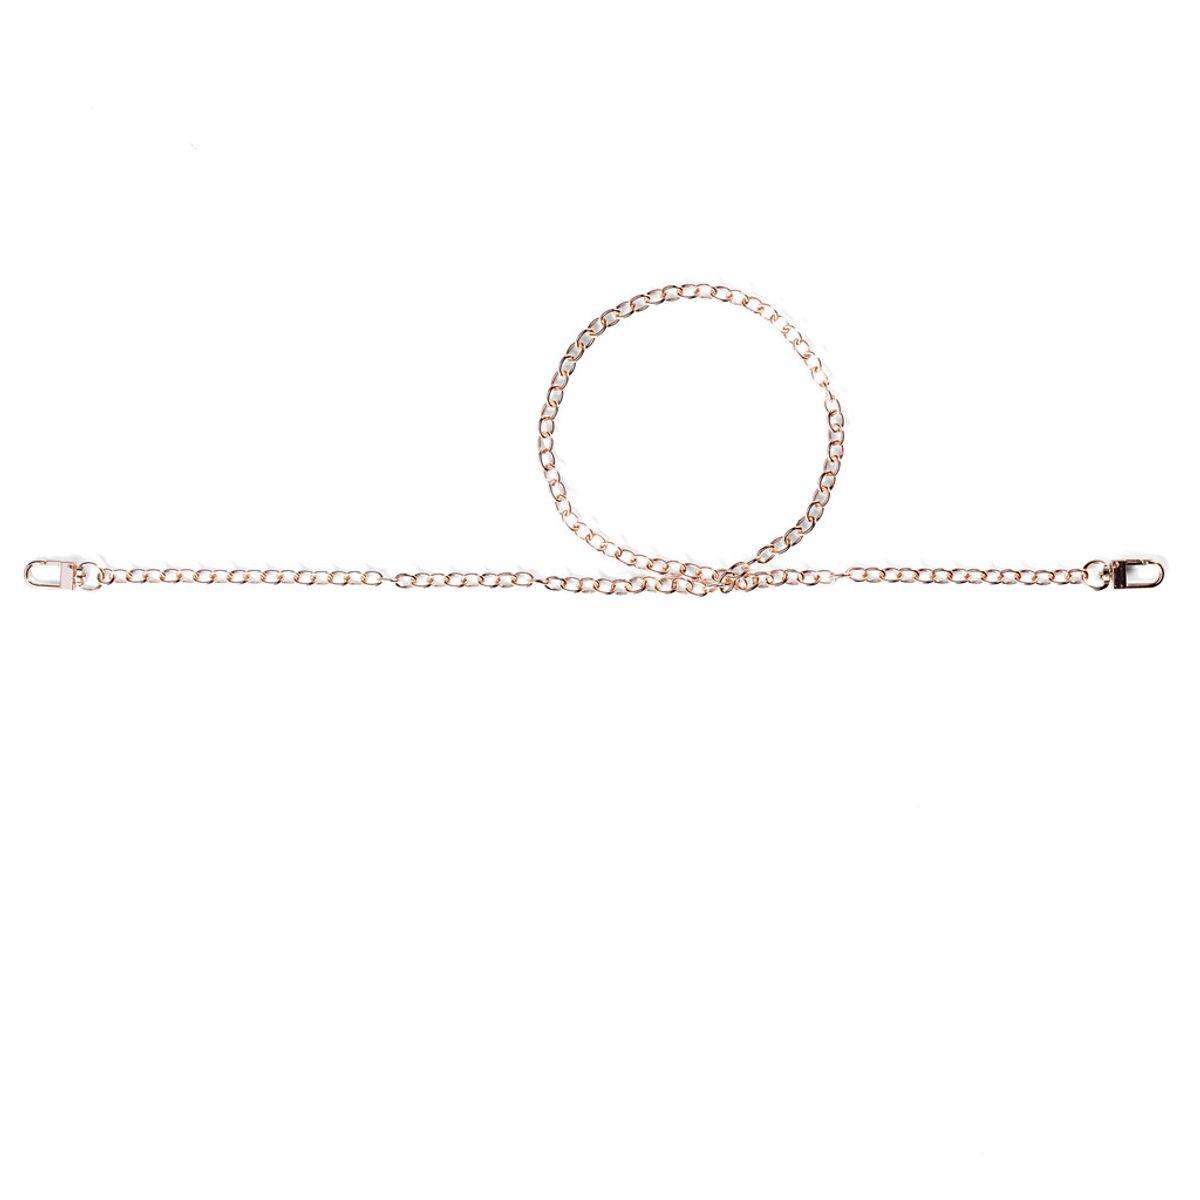 Chaine pour sac à main Rosali 88 cm - Or rose